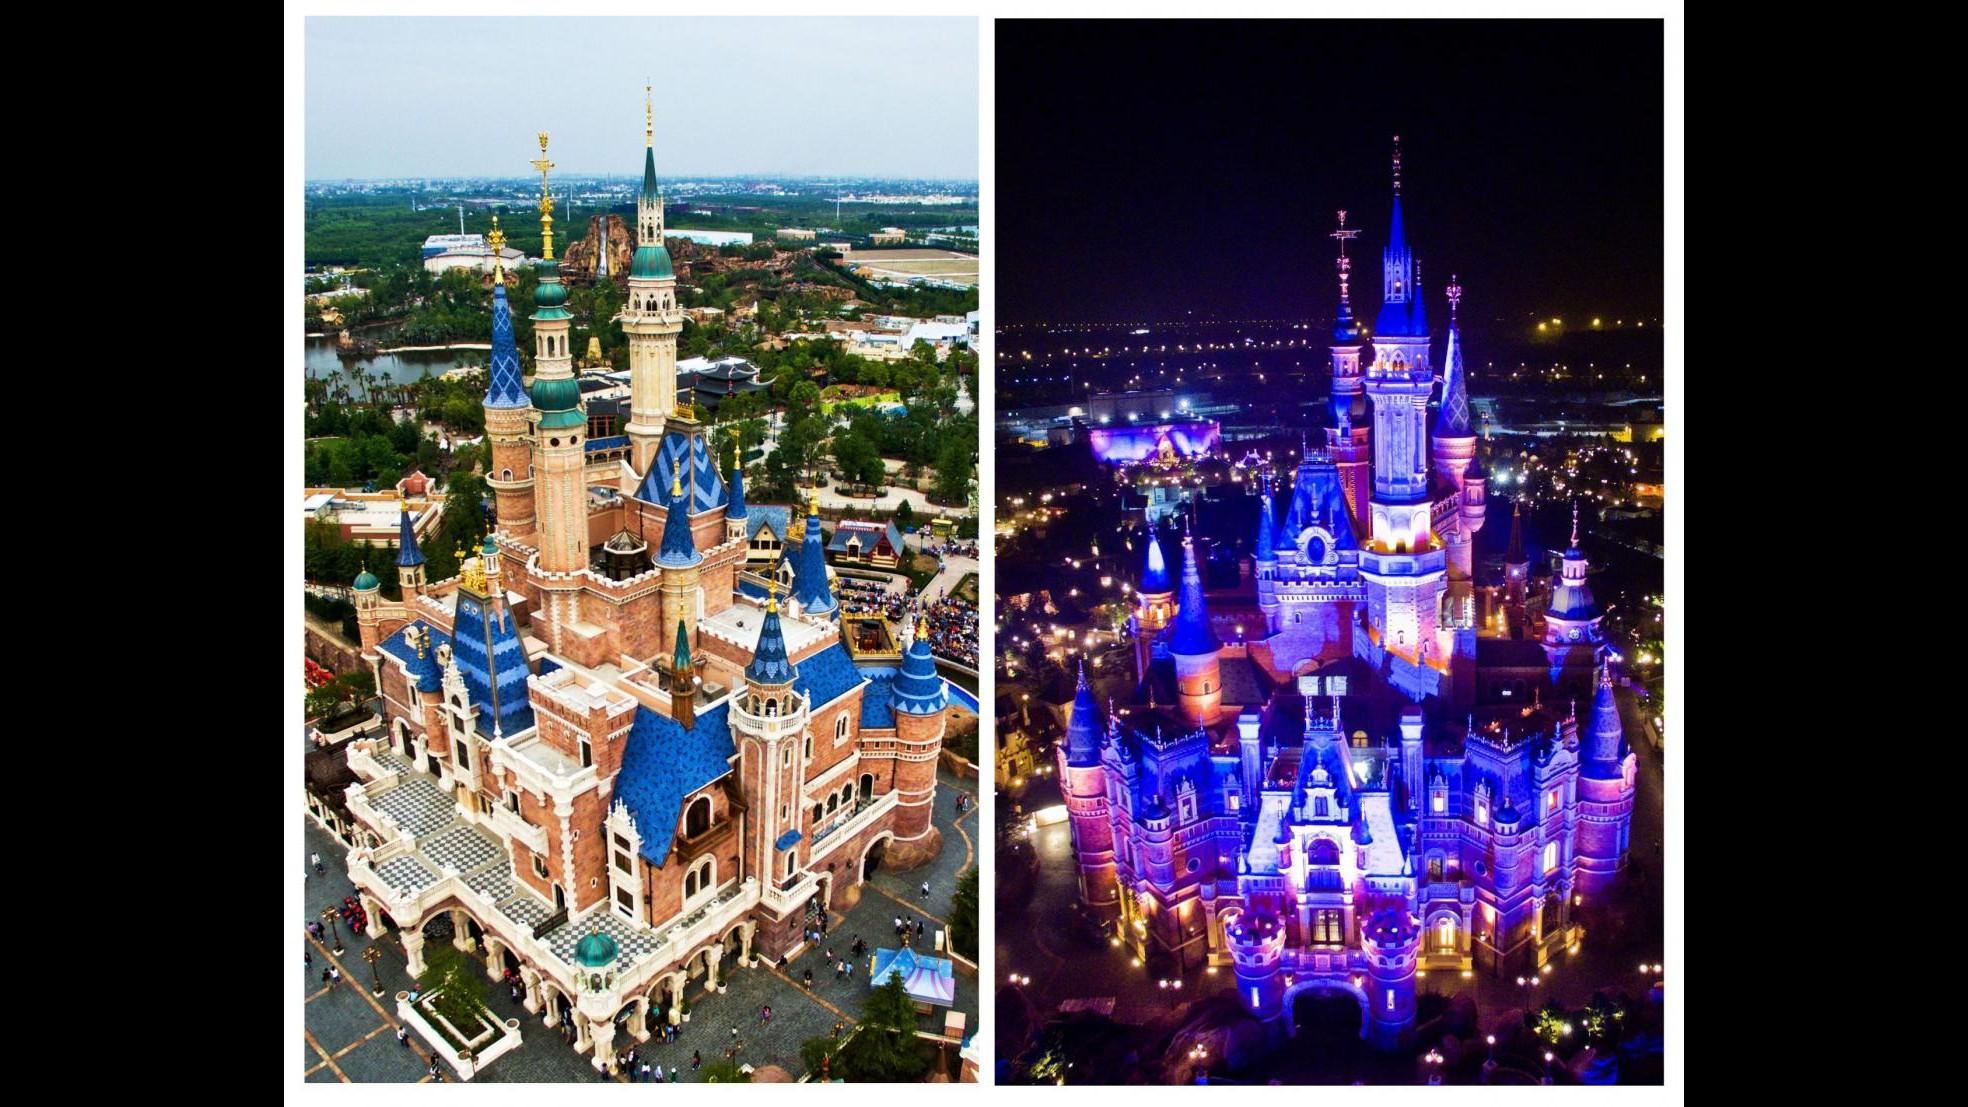 FOTO Disneyland a Shanghai: prova luci in vista dell'apertura